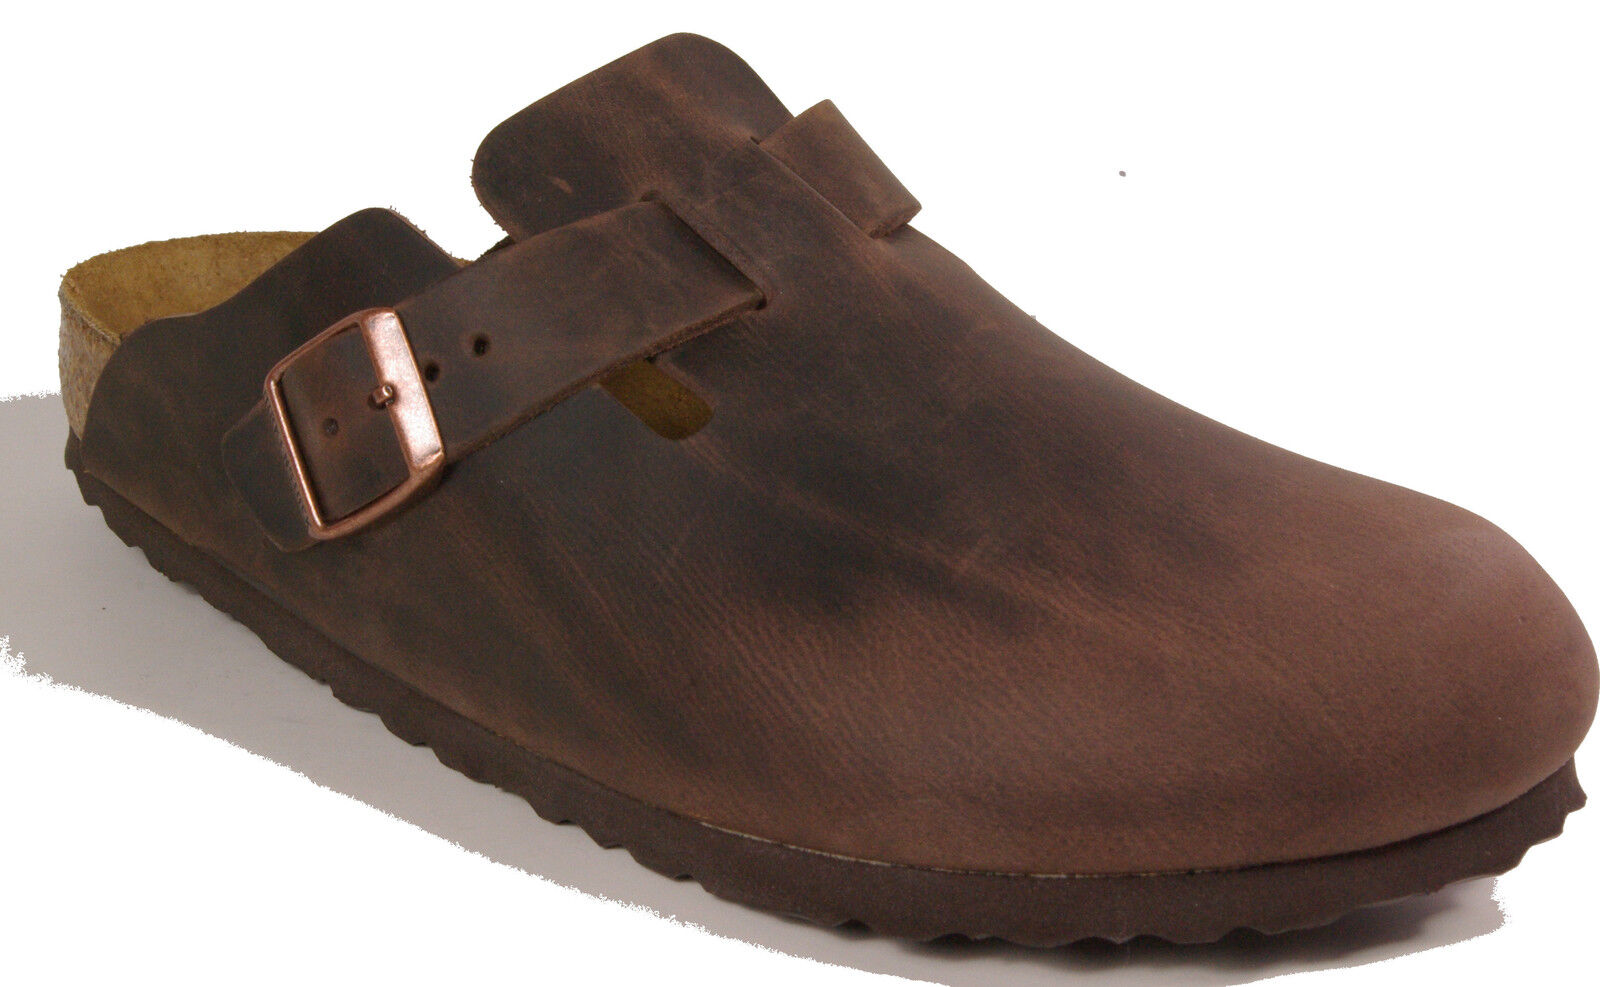 BIRKENSTOCK 0860131 BOSTON BOSTON BOSTON HABANNA Brown leather REGULAR footbed NEW cece20